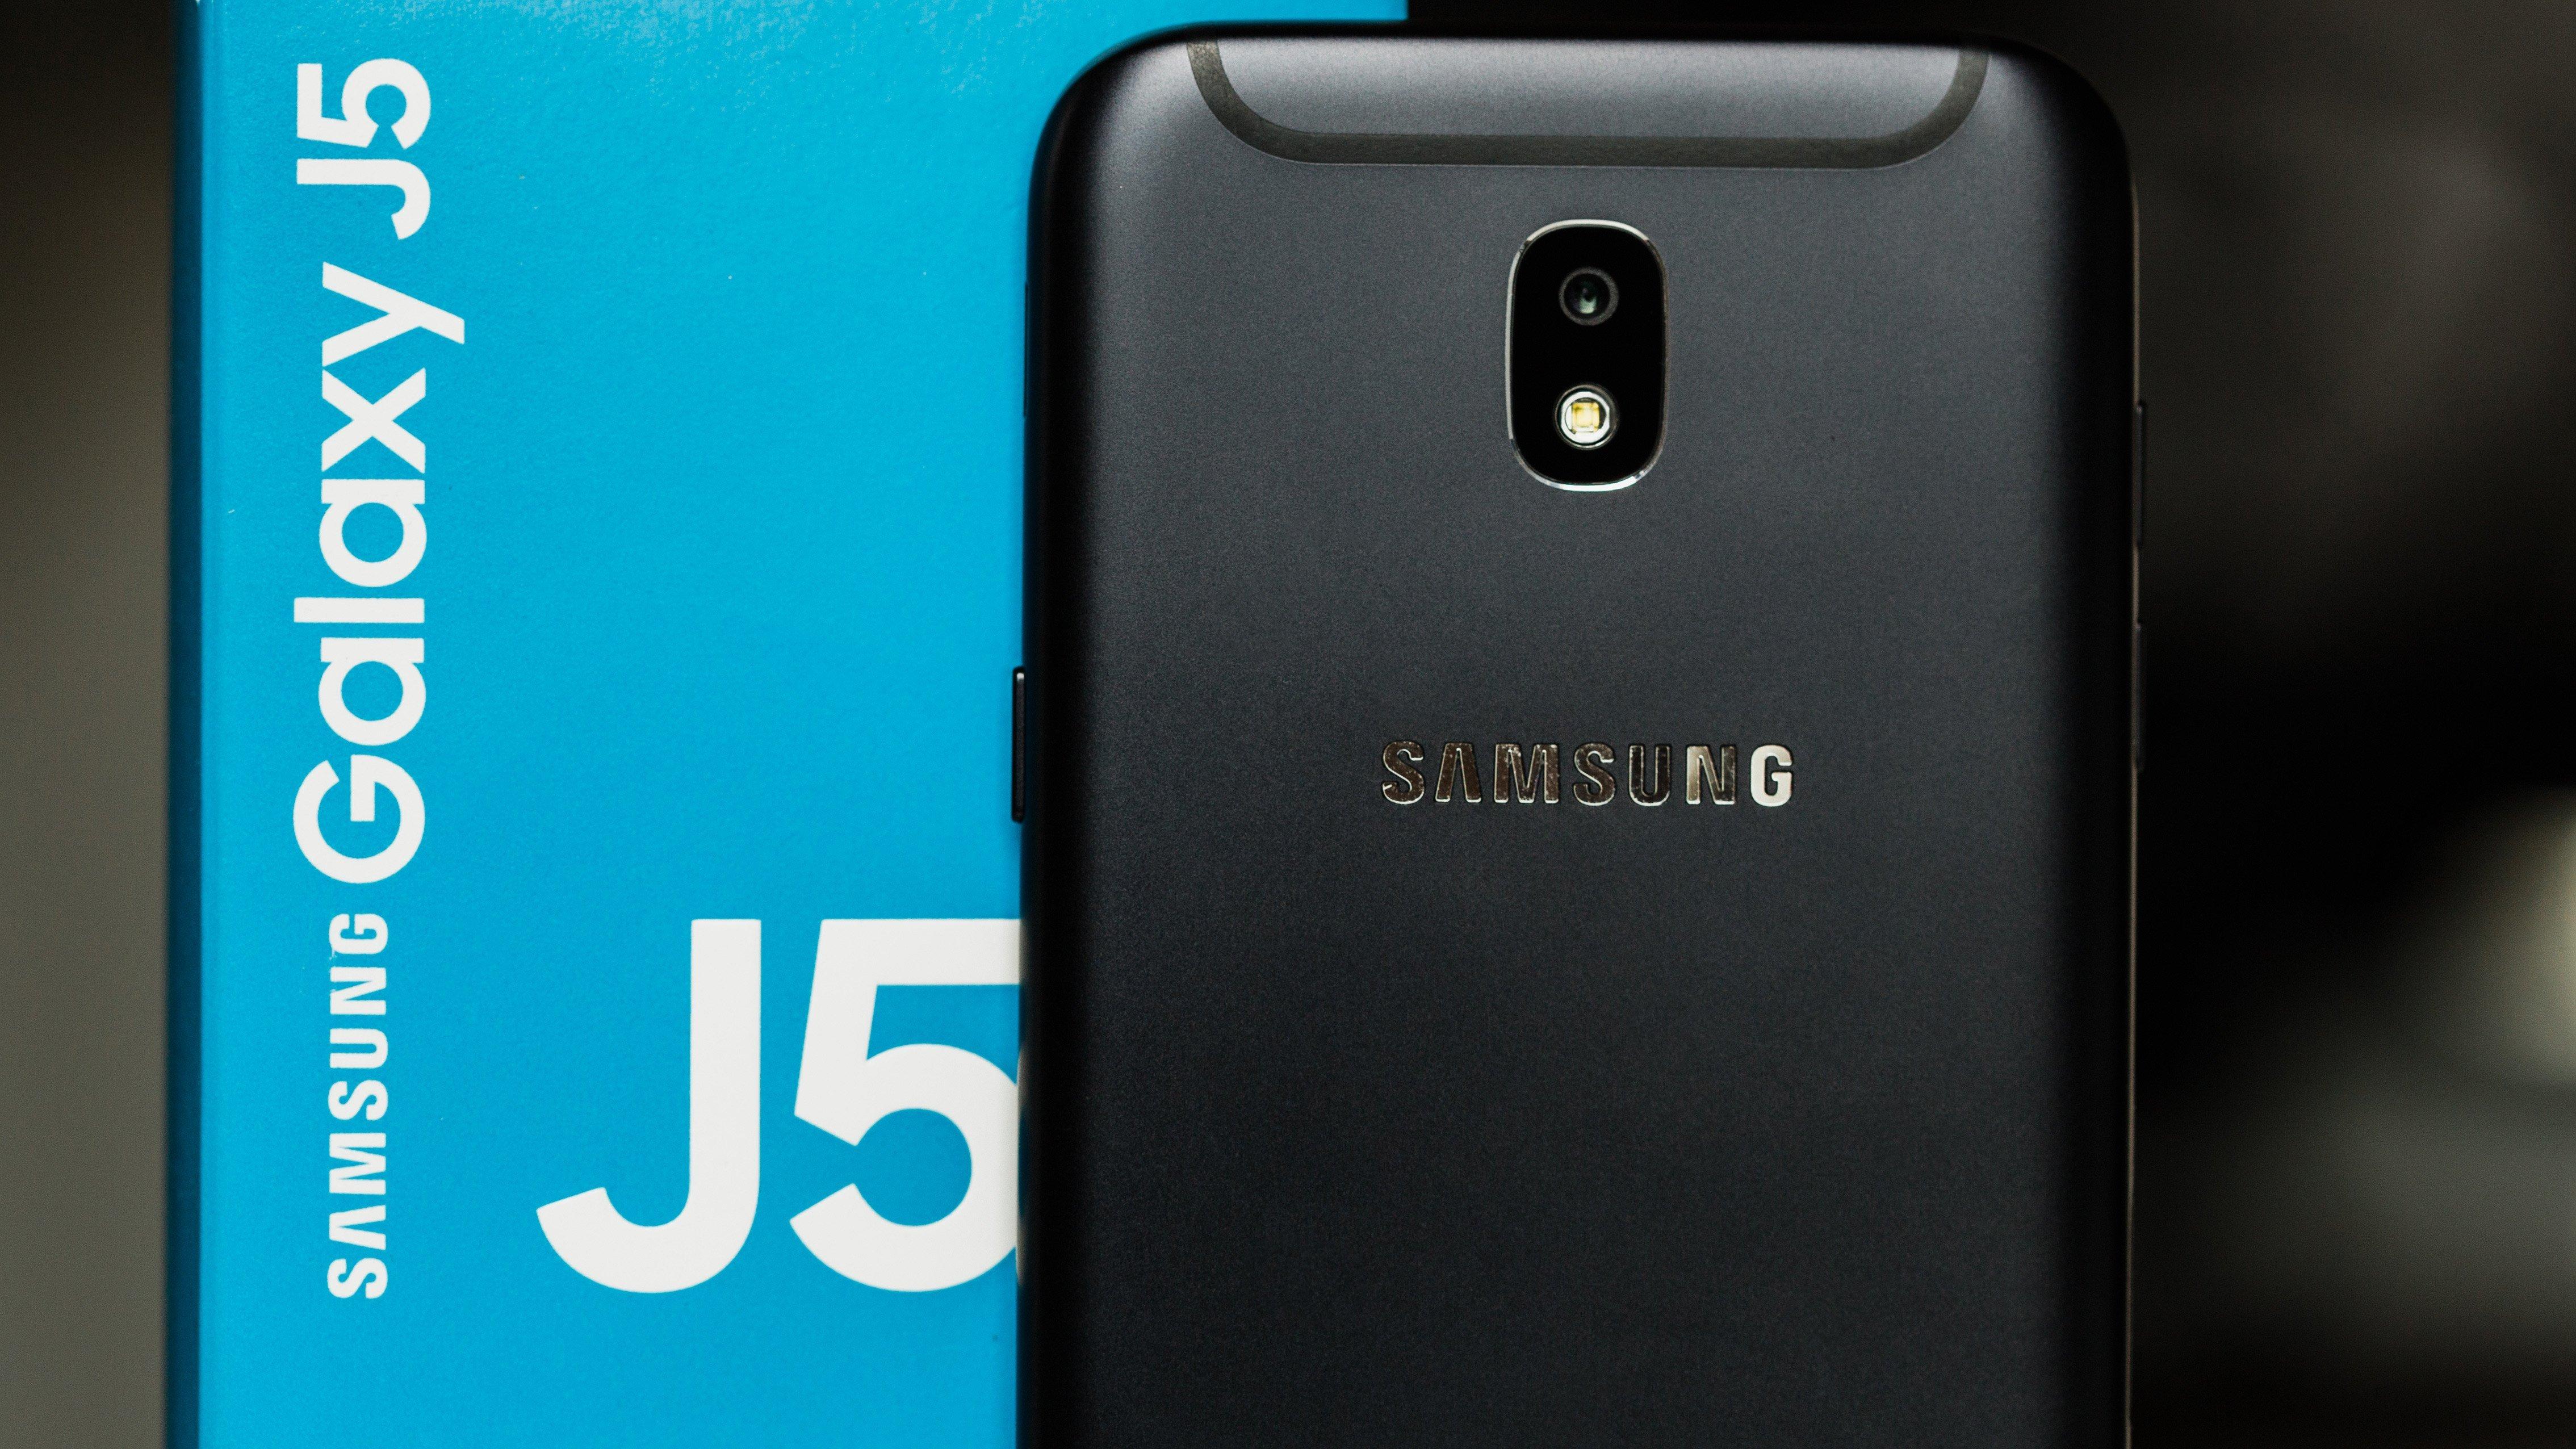 Galaxy Note 9 - технические характеристики, обзоры, дата выхода, новости | AndroidInsider.ru